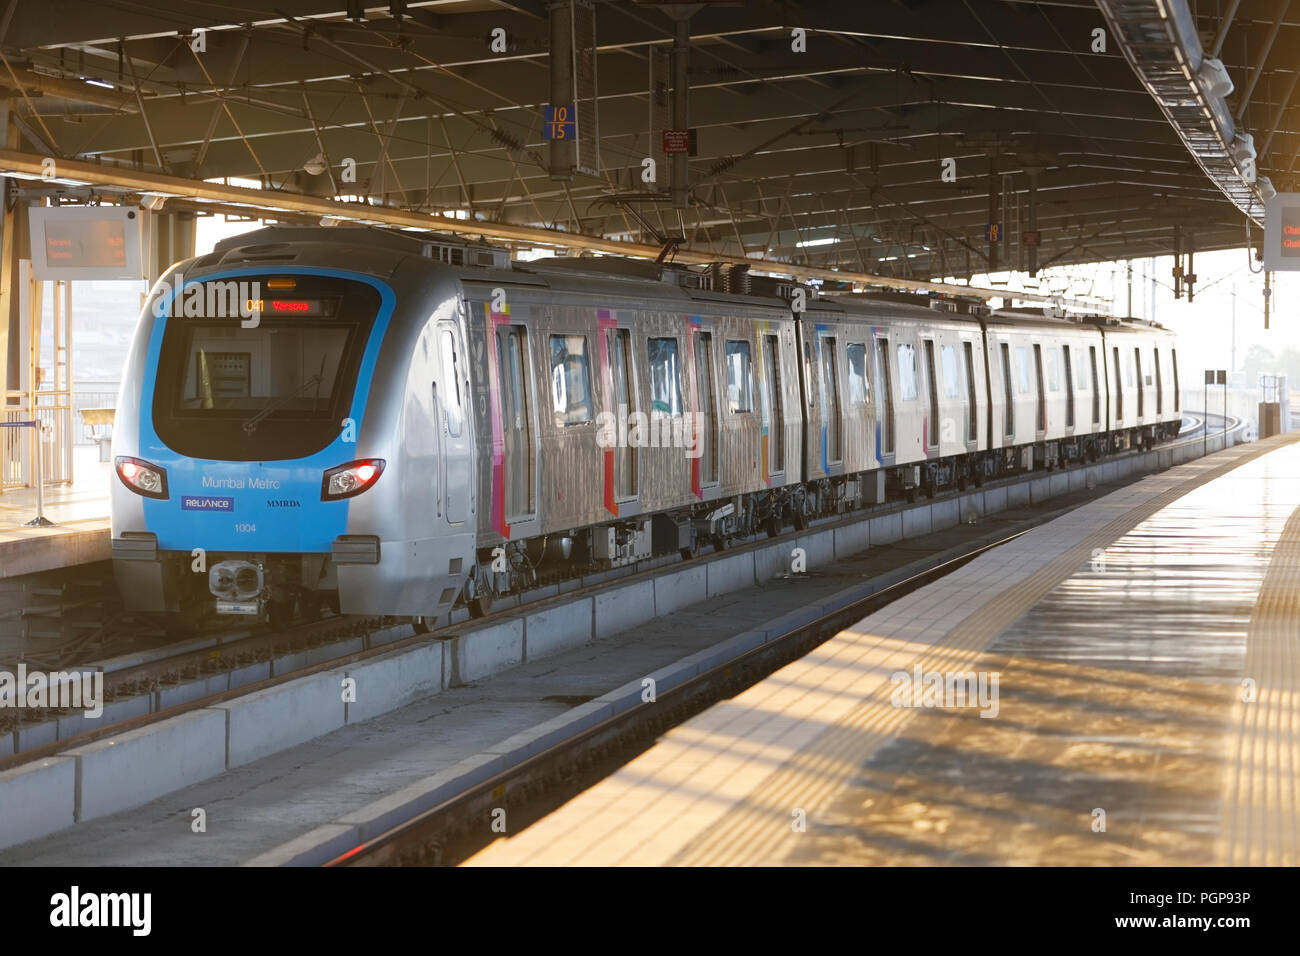 Mumbai Metro train interior and exterior. Comfortable, modern , fast, new & air conditioned way of transport in Mumbai India, Stock Photo